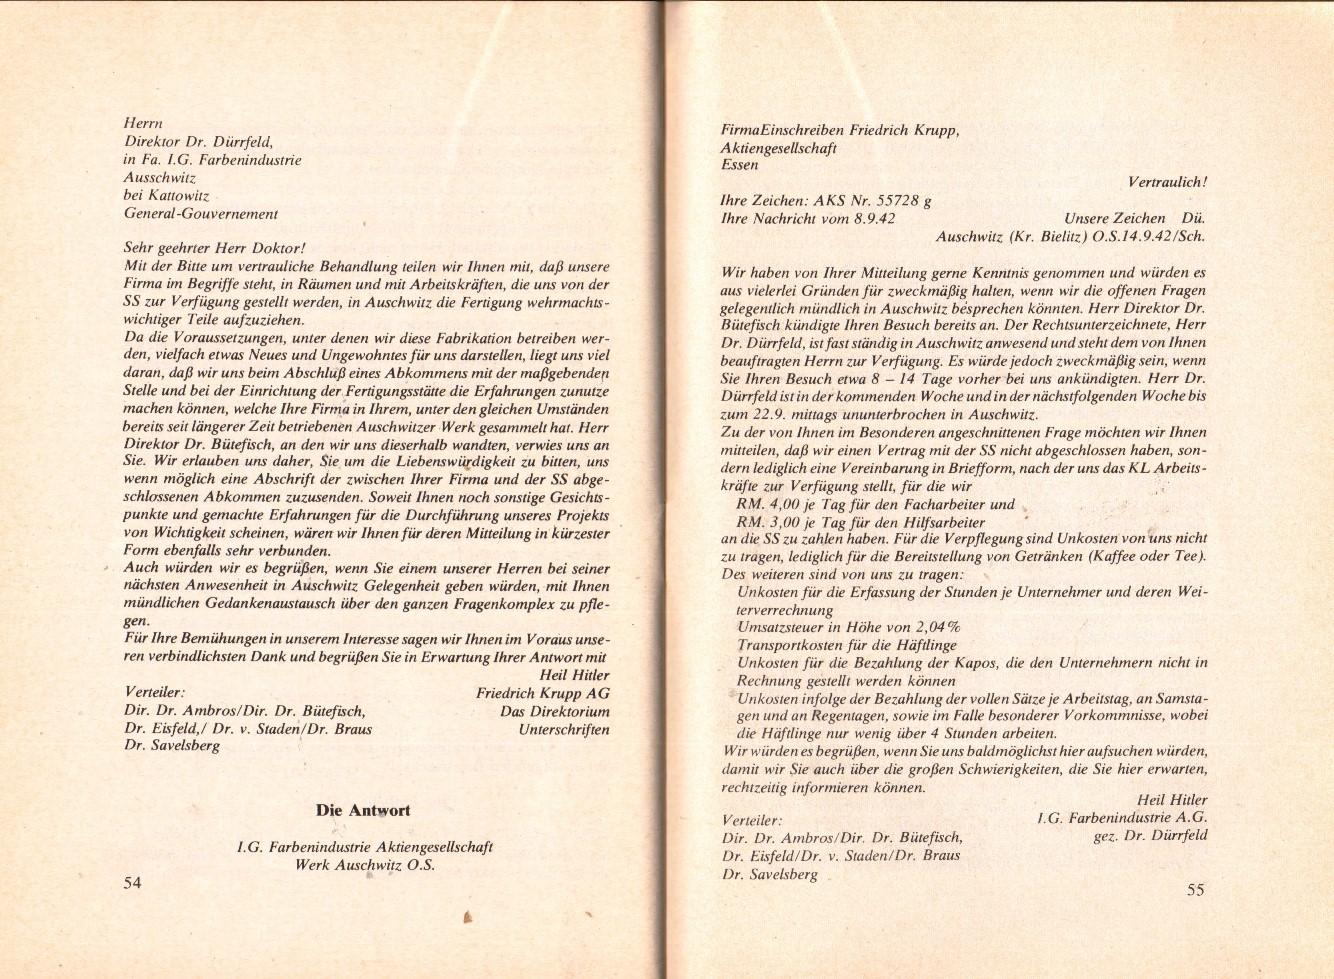 NRW_KBW_1977_Politik_der_Kohle_u_Stahlbarone_29